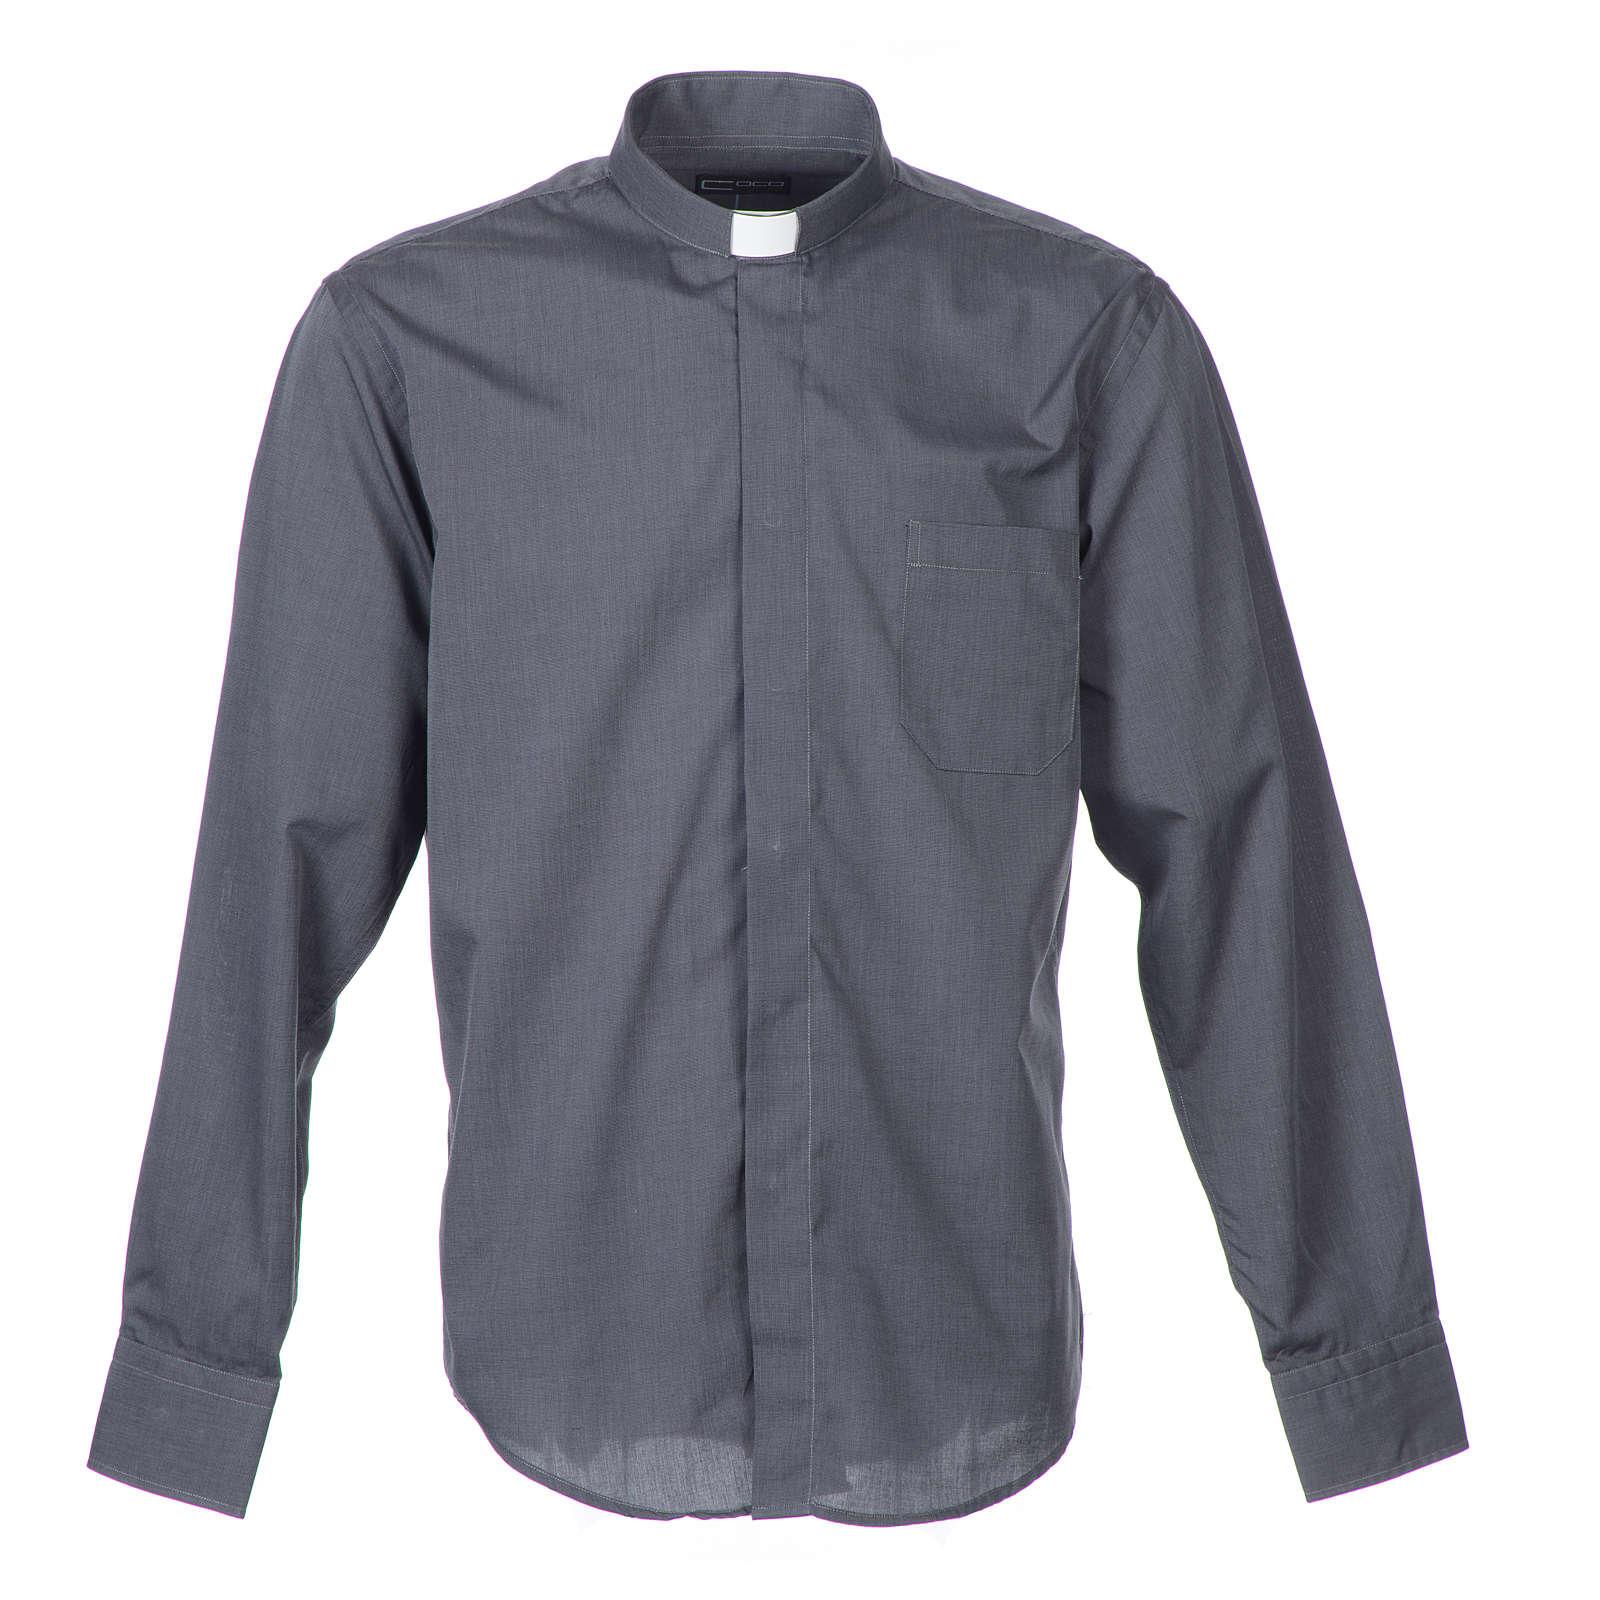 Camisa Clergy Manga Larga Hilo a Hilo, Mixto Algodón Gris 4